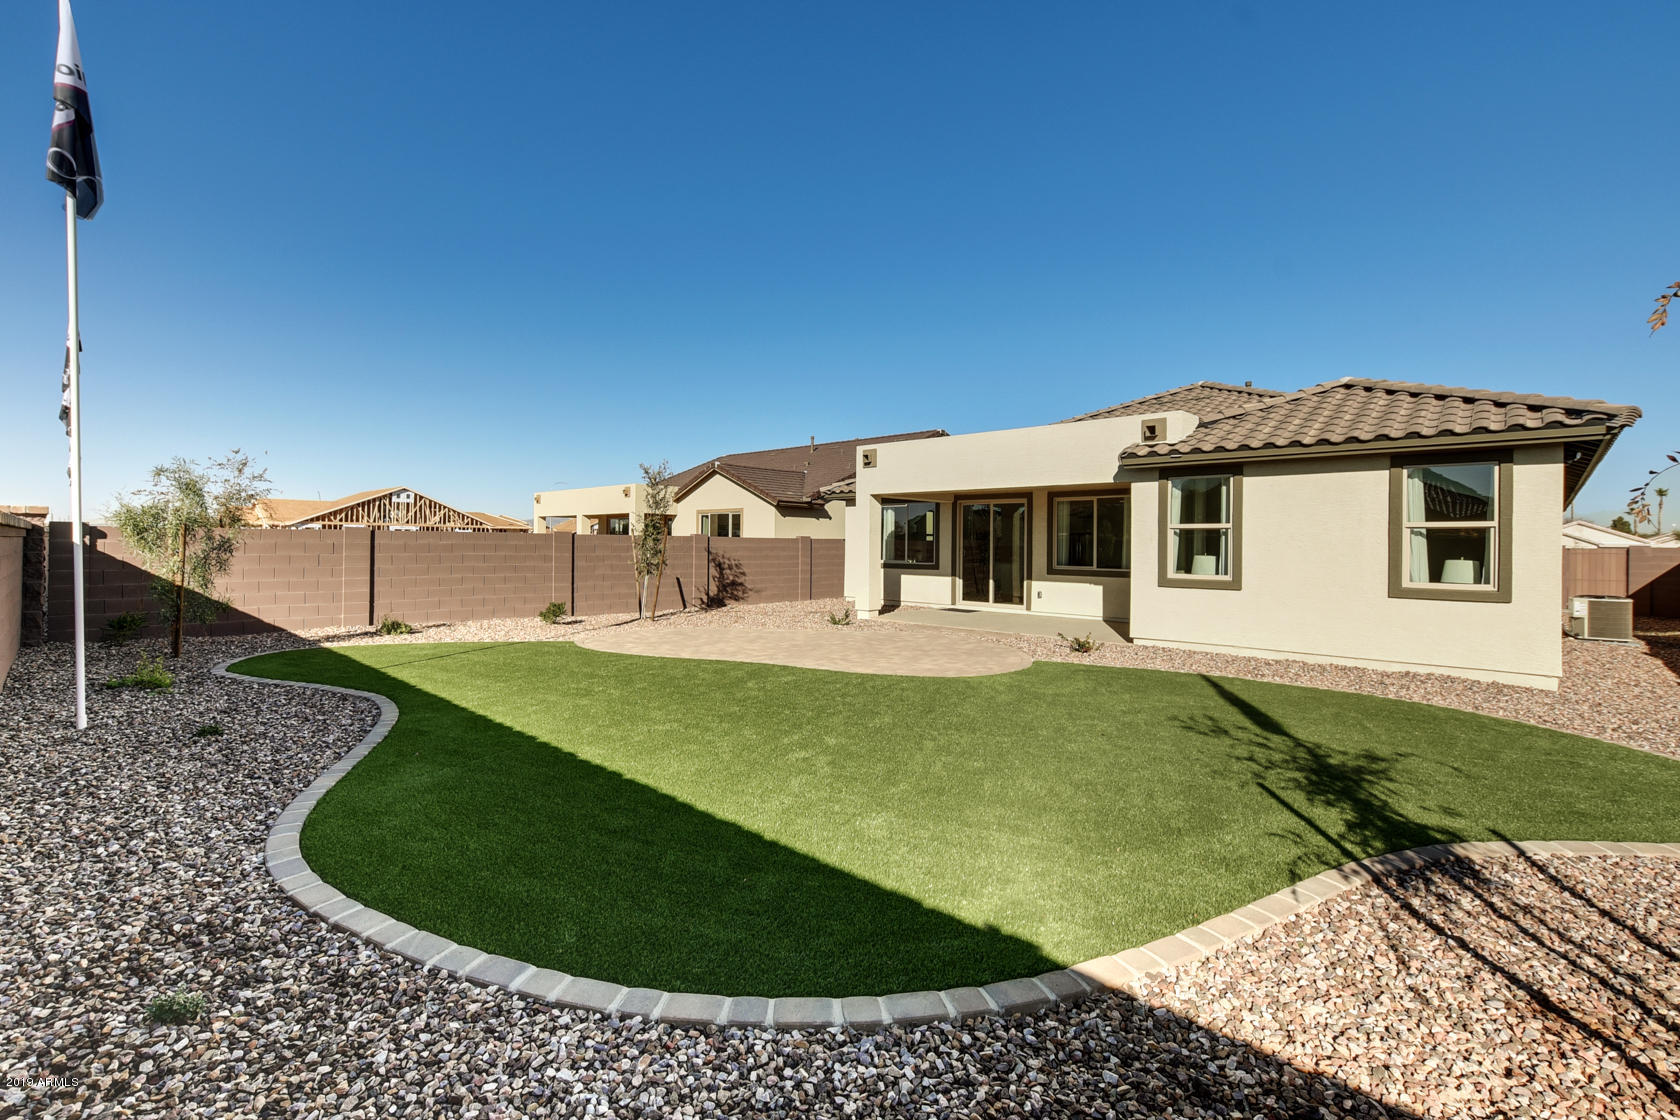 MLS 5863763 11322 W VERNON Avenue, Avondale, AZ 85392 Avondale AZ Newly Built